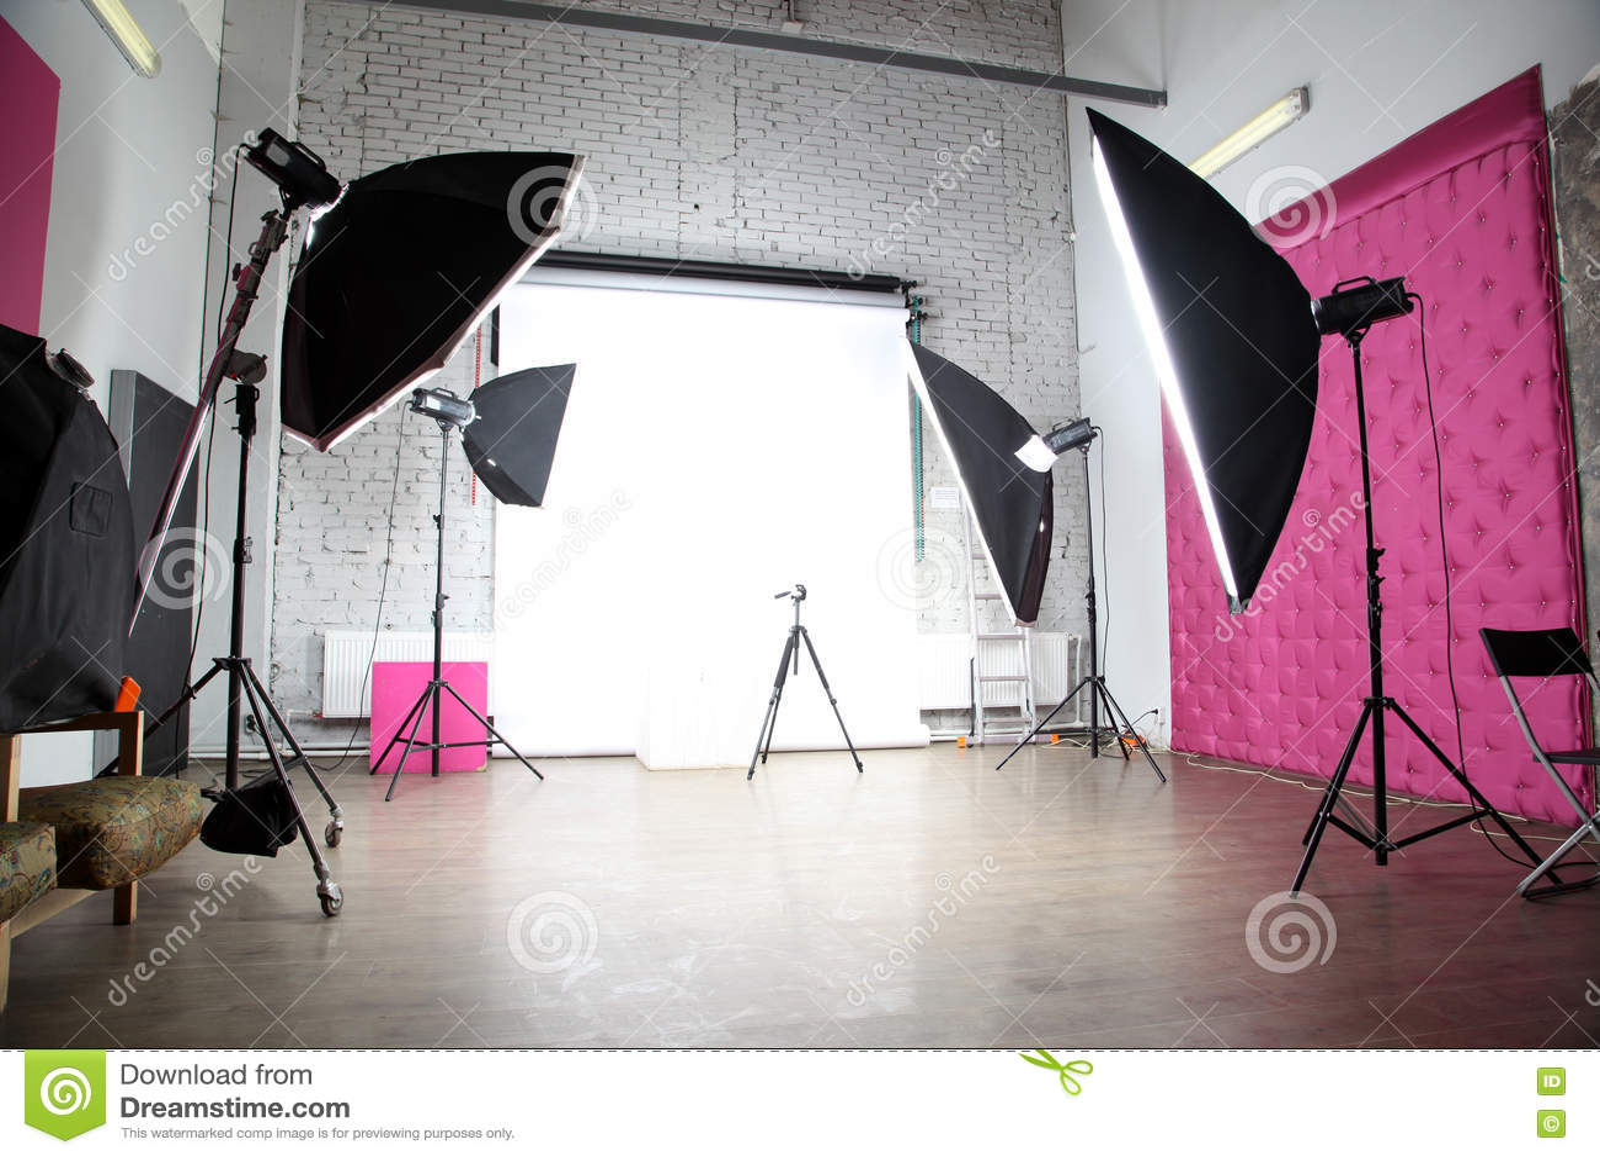 Interior of a modern photo video studio